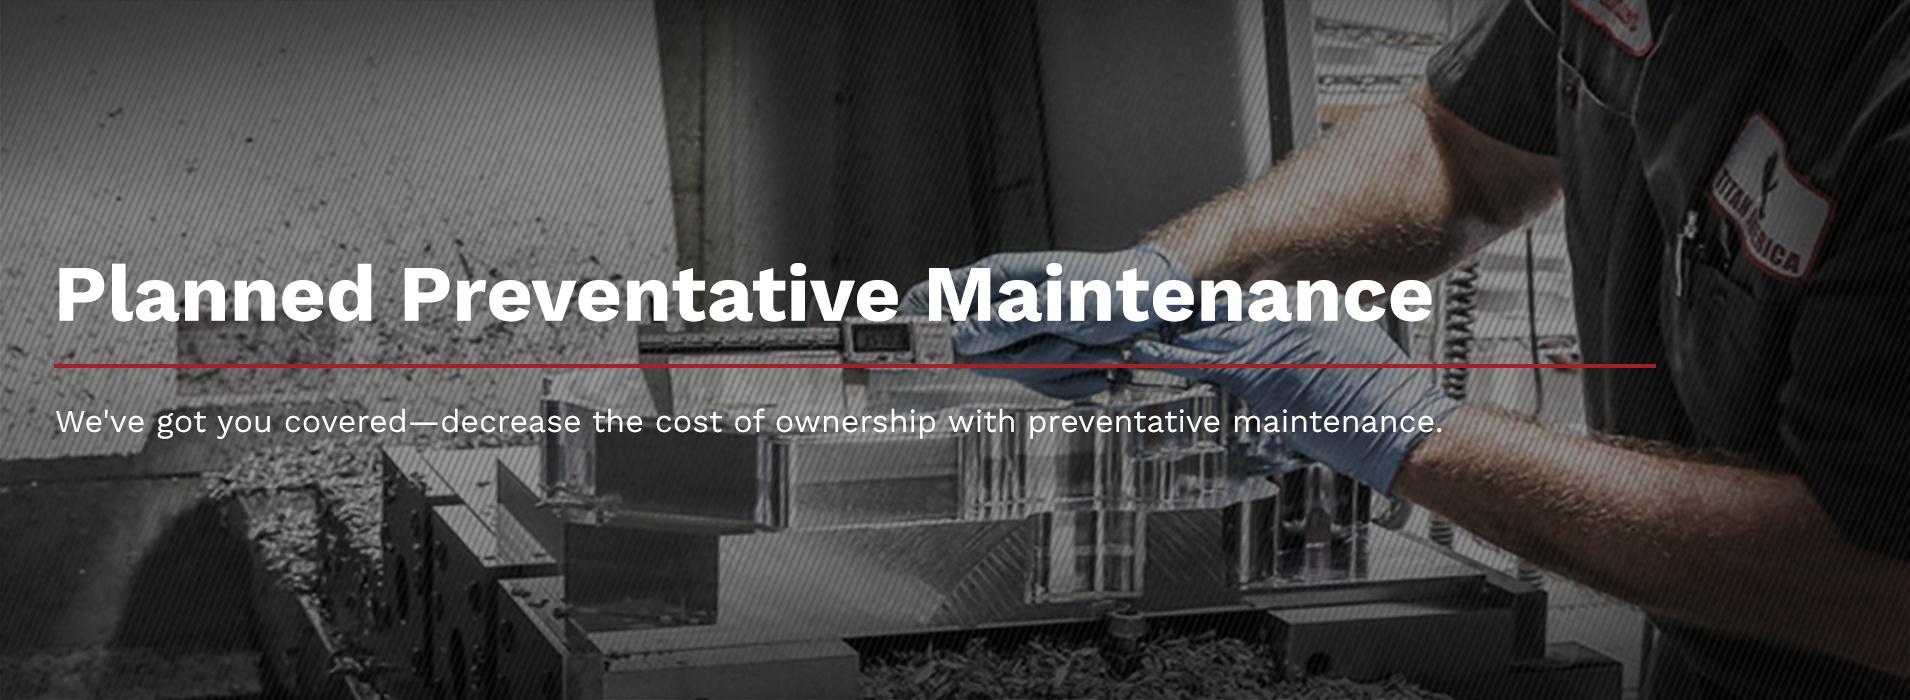 Planned Preventative Maintenance.jpg